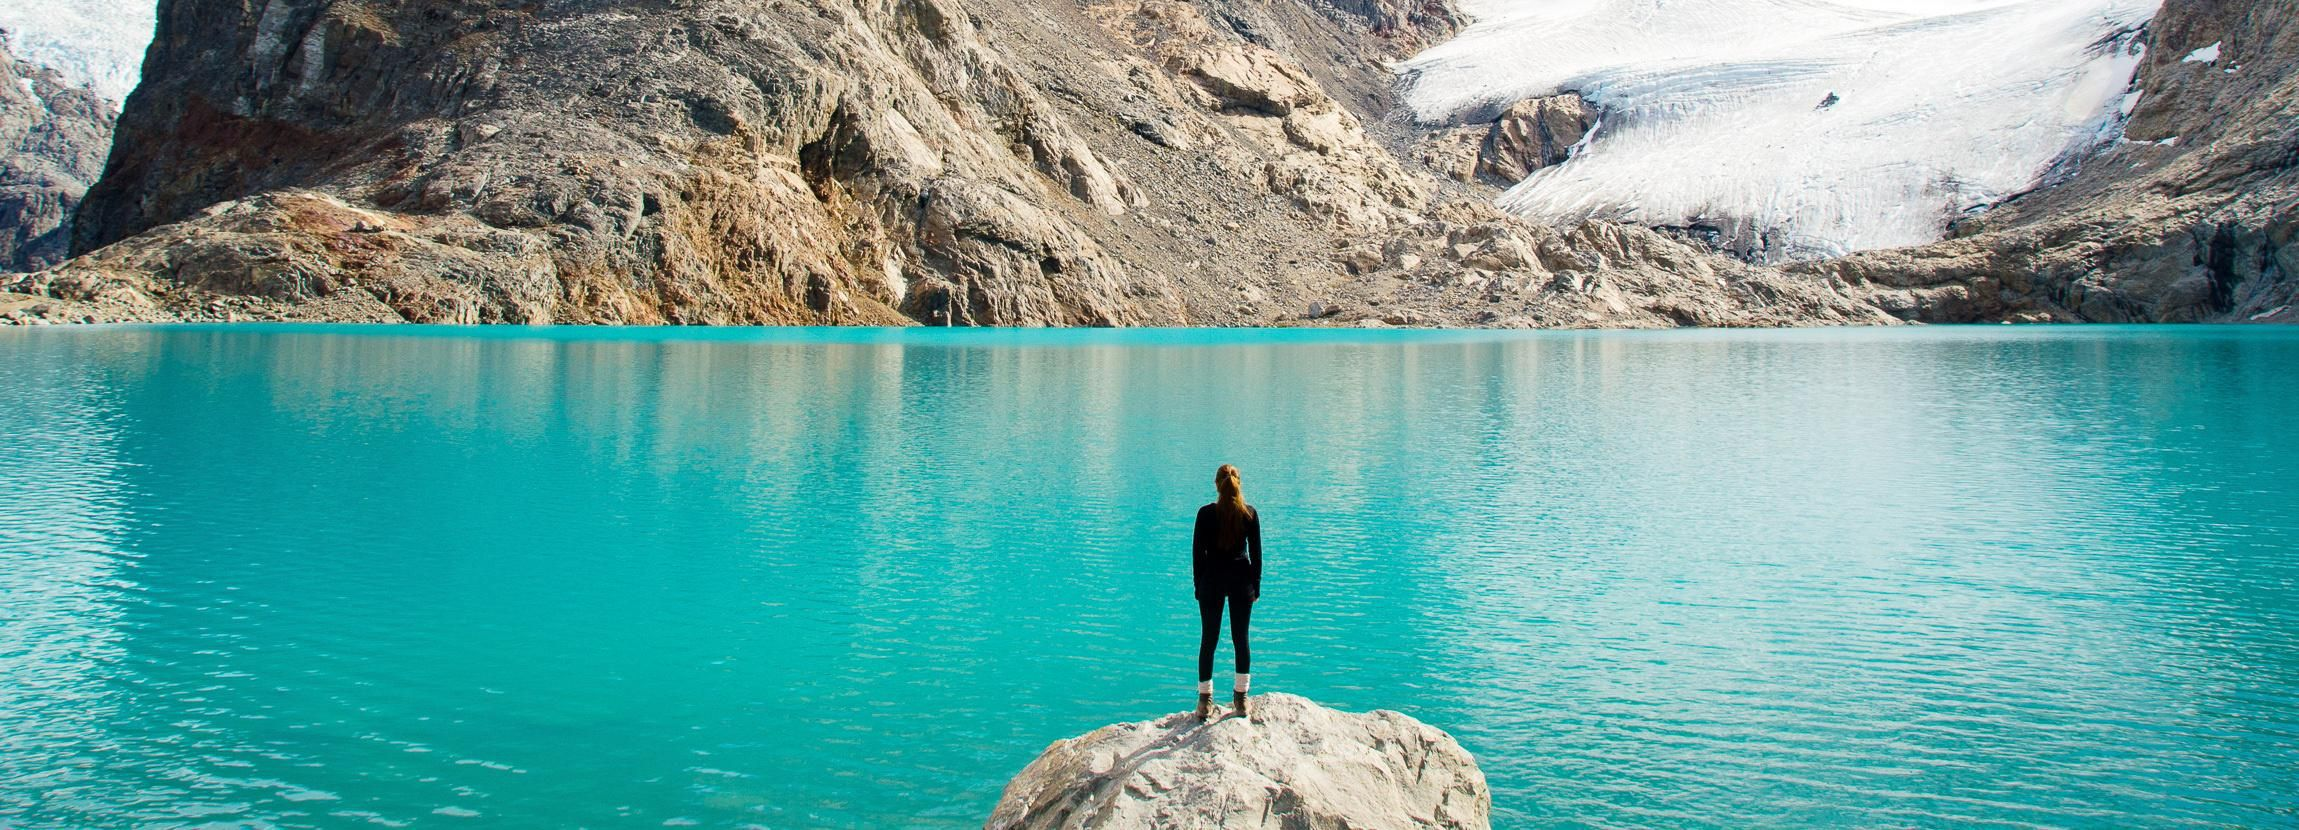 El Chalten / Calafate: tour guidato di trekking della Laguna de los Tres